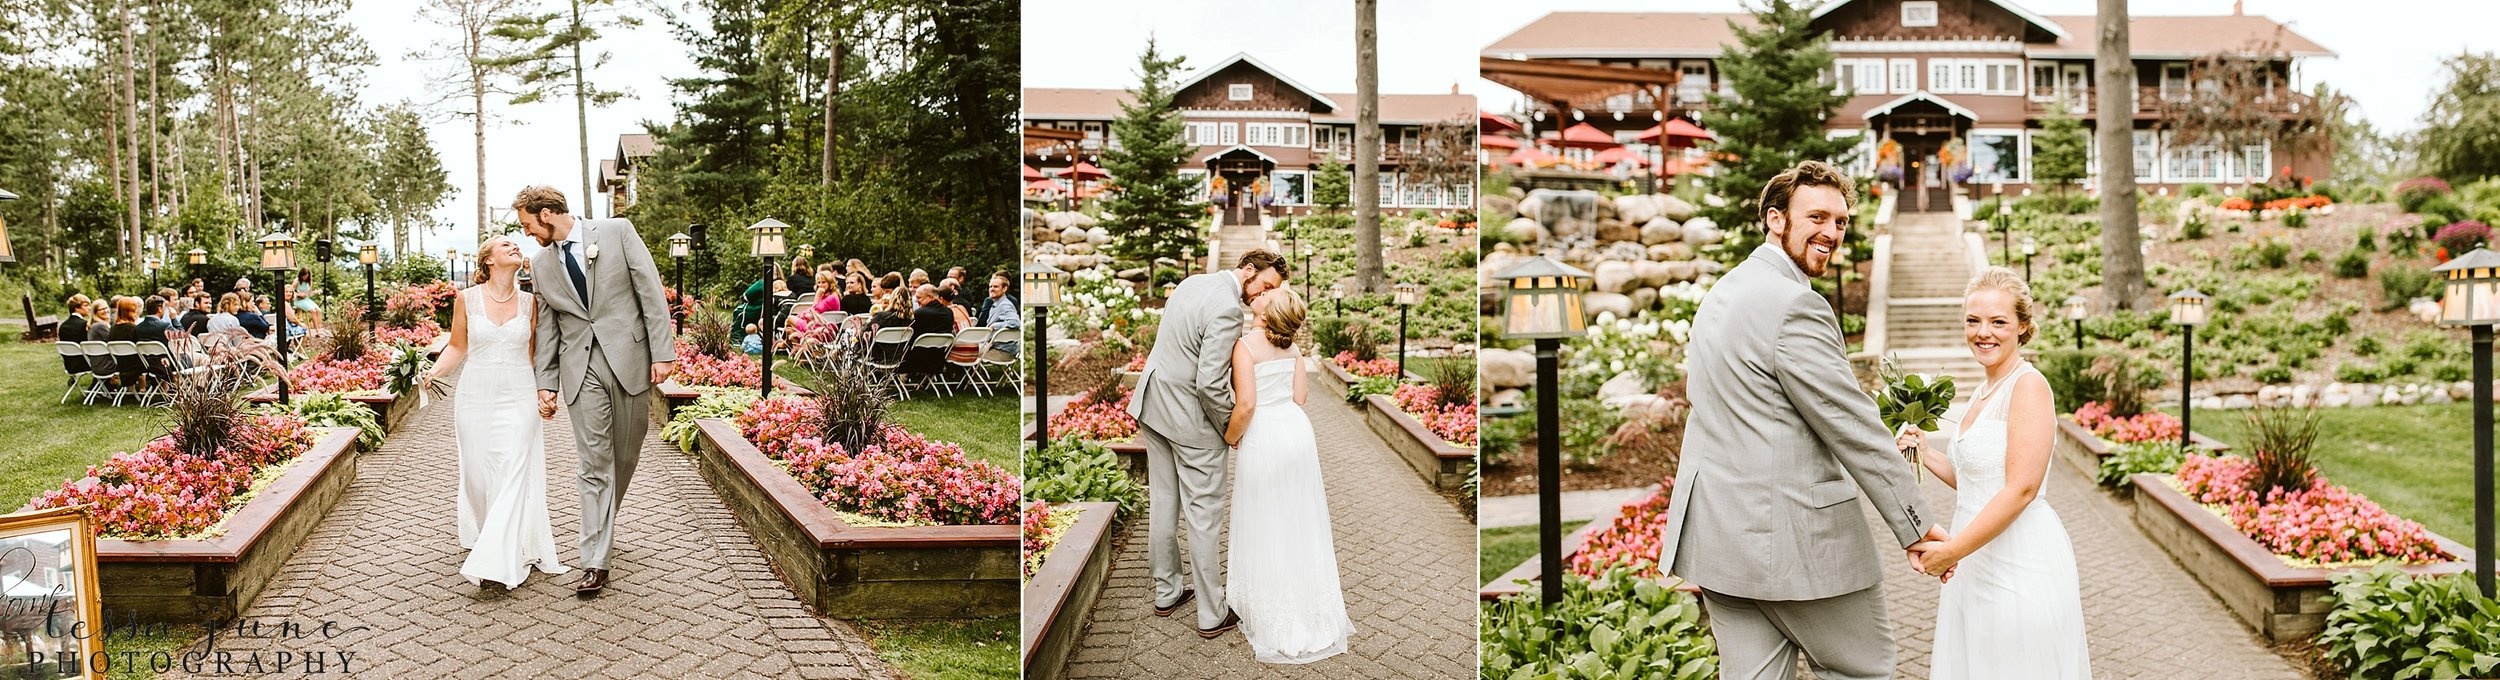 grandview-lodge-wedding-nisswa-minnesota-ceremony